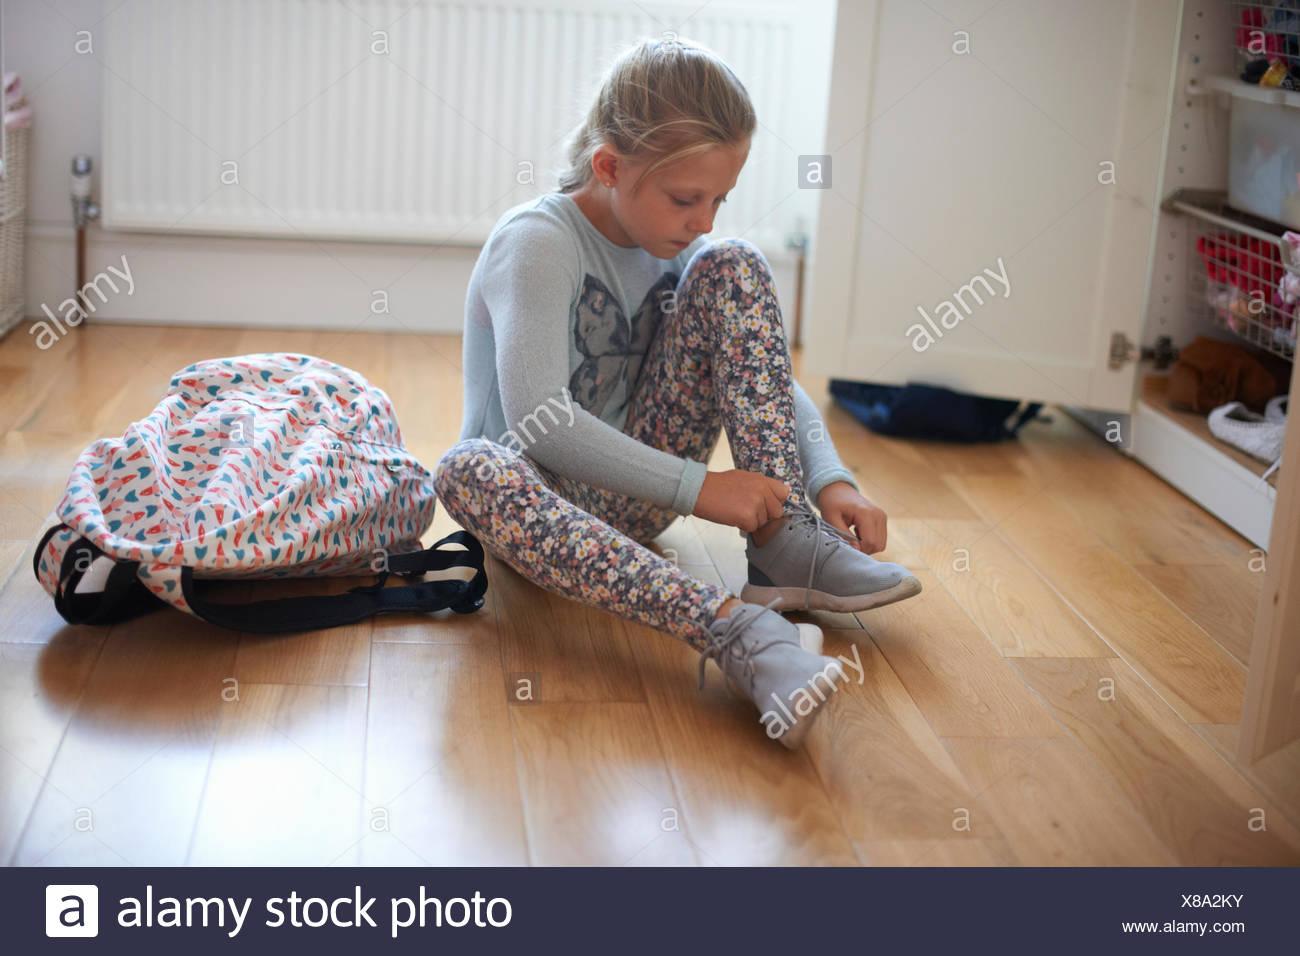 Girl sitting on bedroom floor tying booty laces - Stock Image